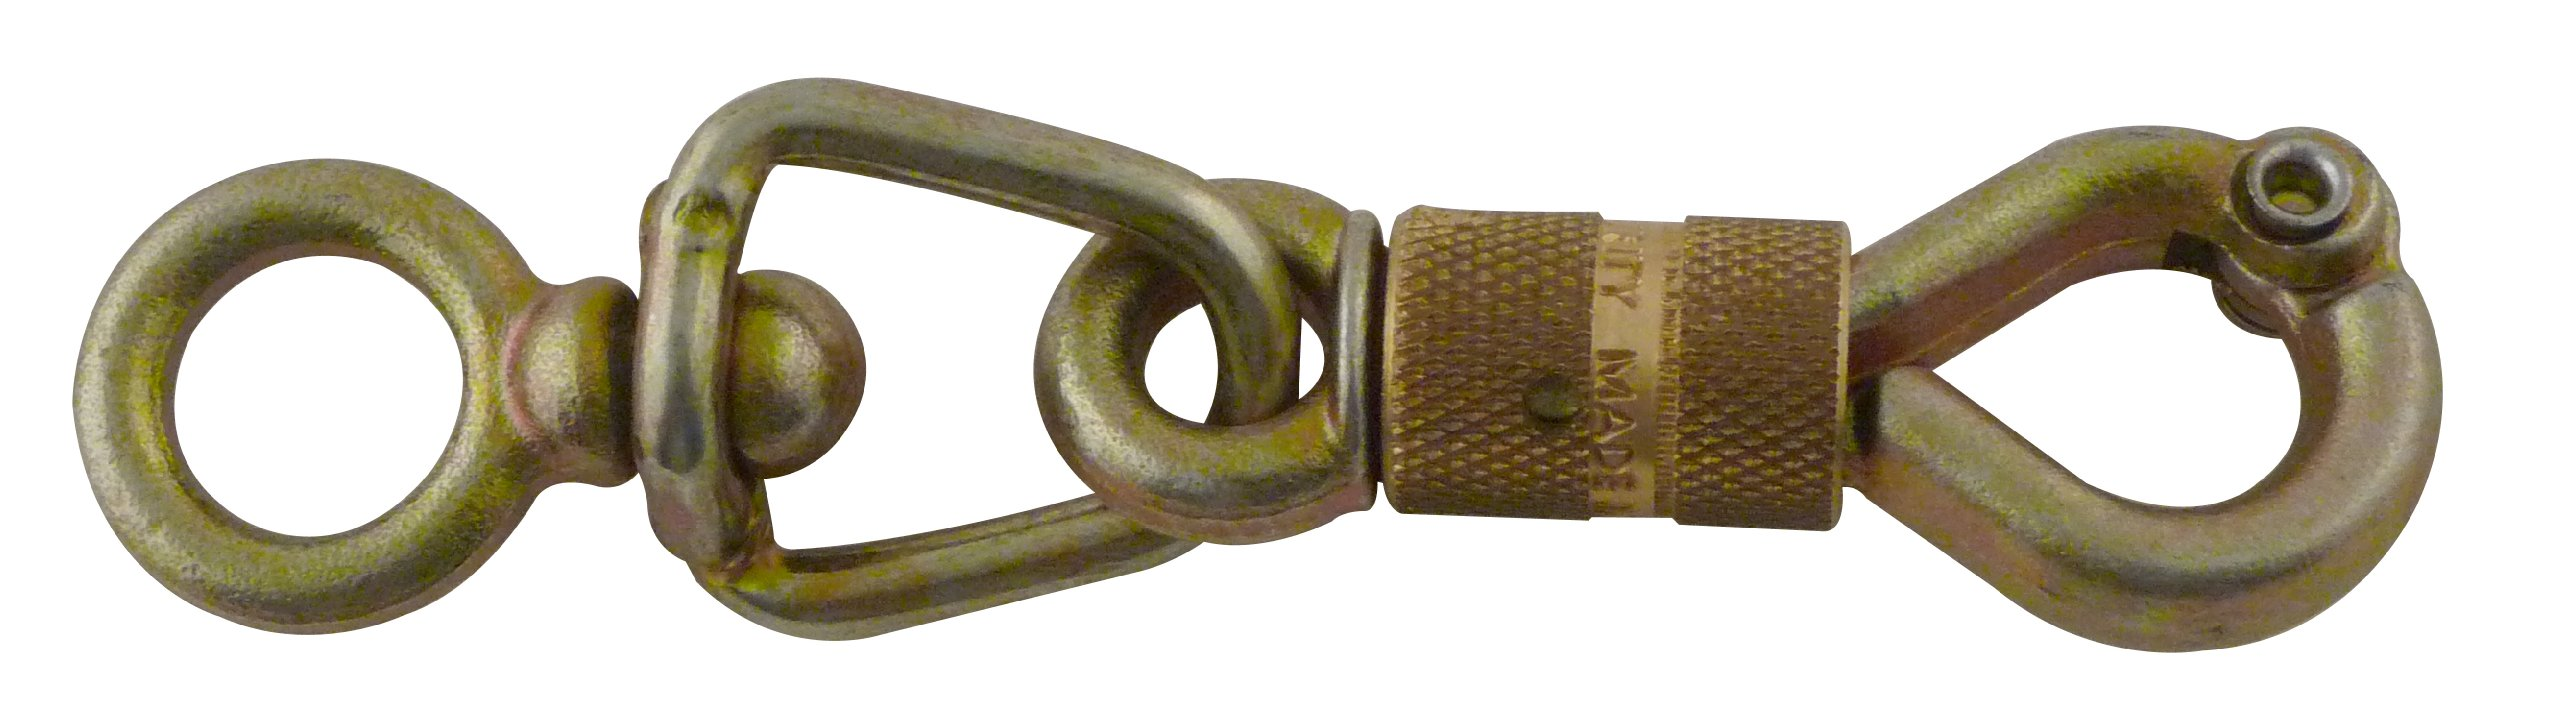 Viso PMS111NP Mild Steel Security Snap Hook - Yellow Zinc Plated